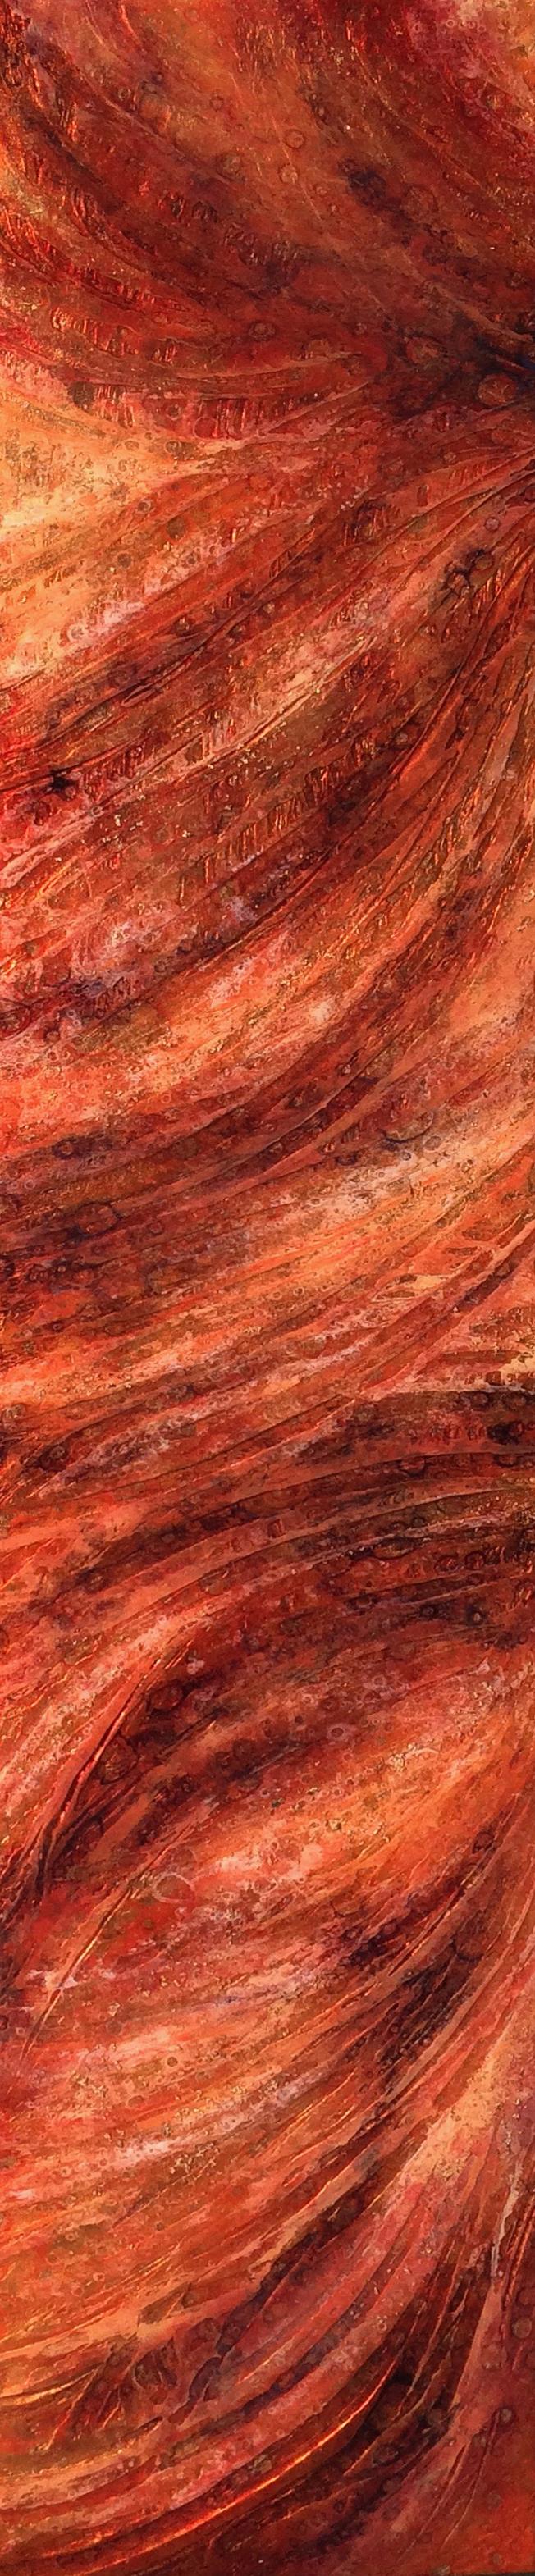 StClaire - Copper Fractals (60 x 12).jpg